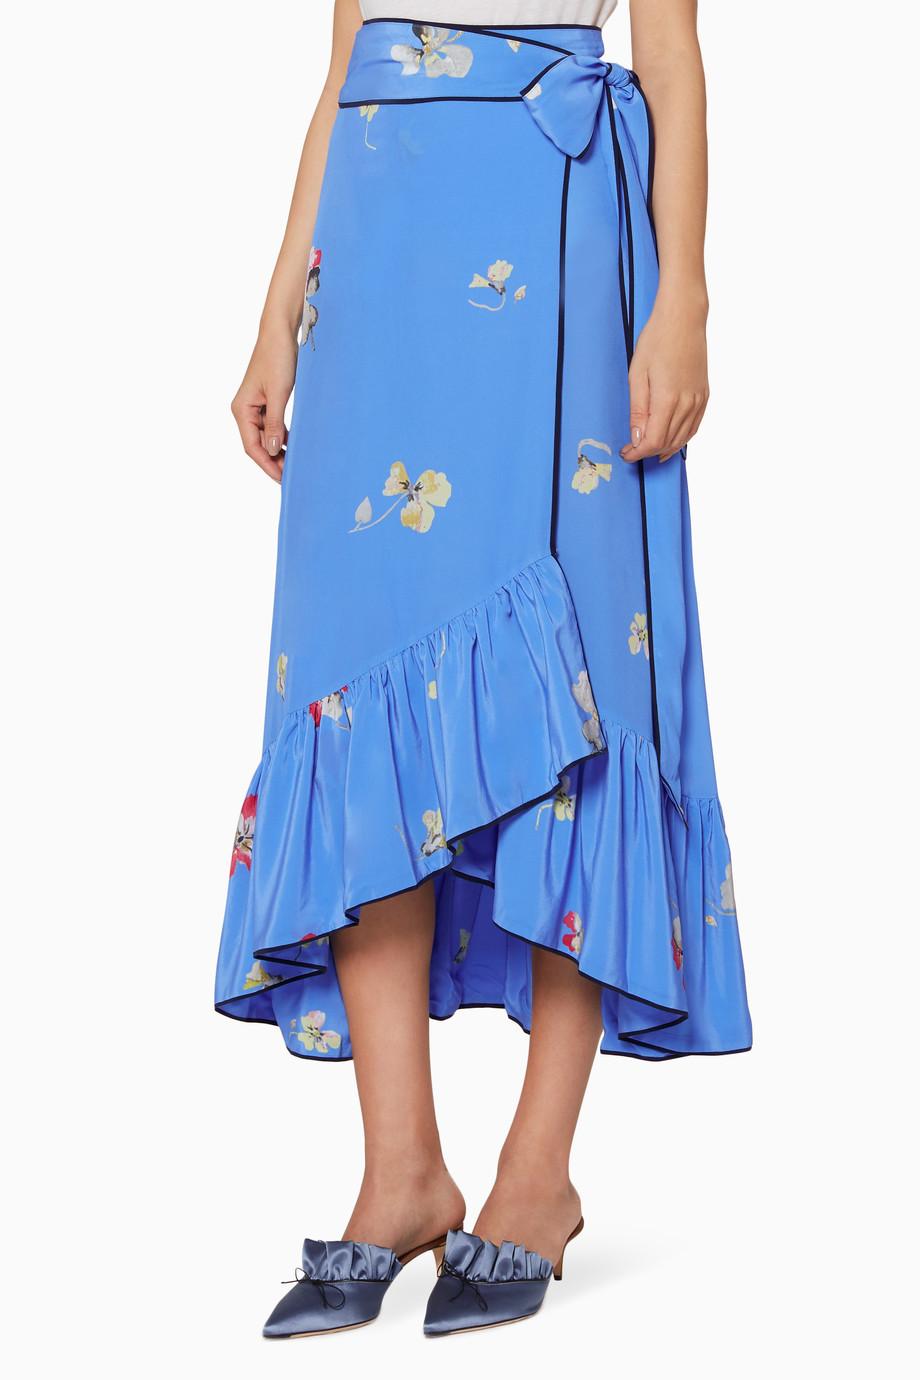 21c1033259 Shop Ganni Blue Blue Floral Printed Joycedale Wrap Skirt for Women ...